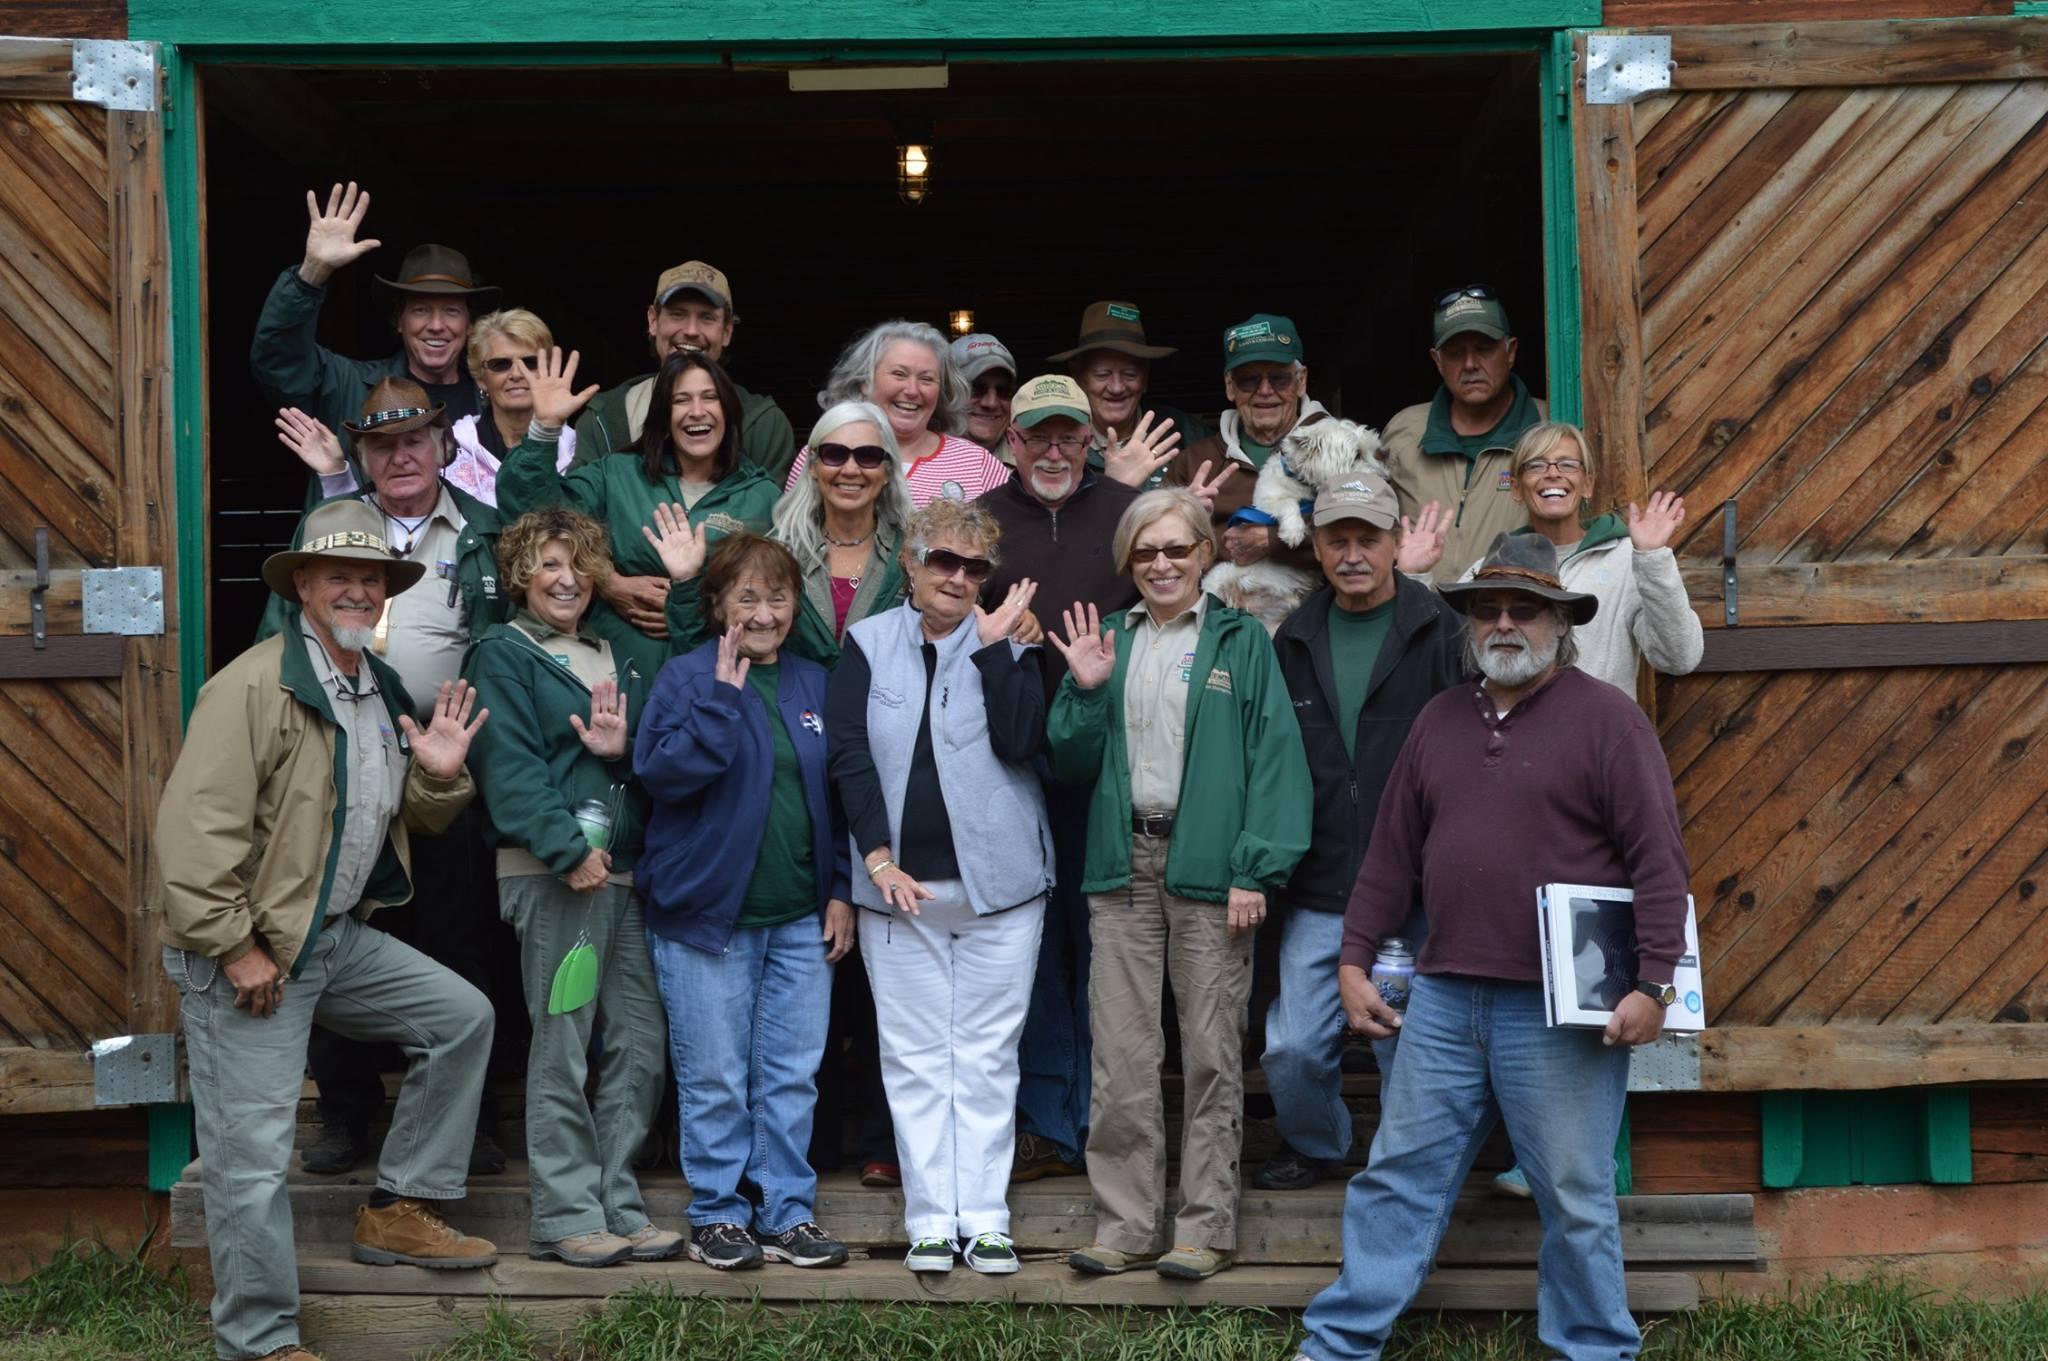 Arapaho-Roosevelt NF\Sulphur Ranger District, 2014